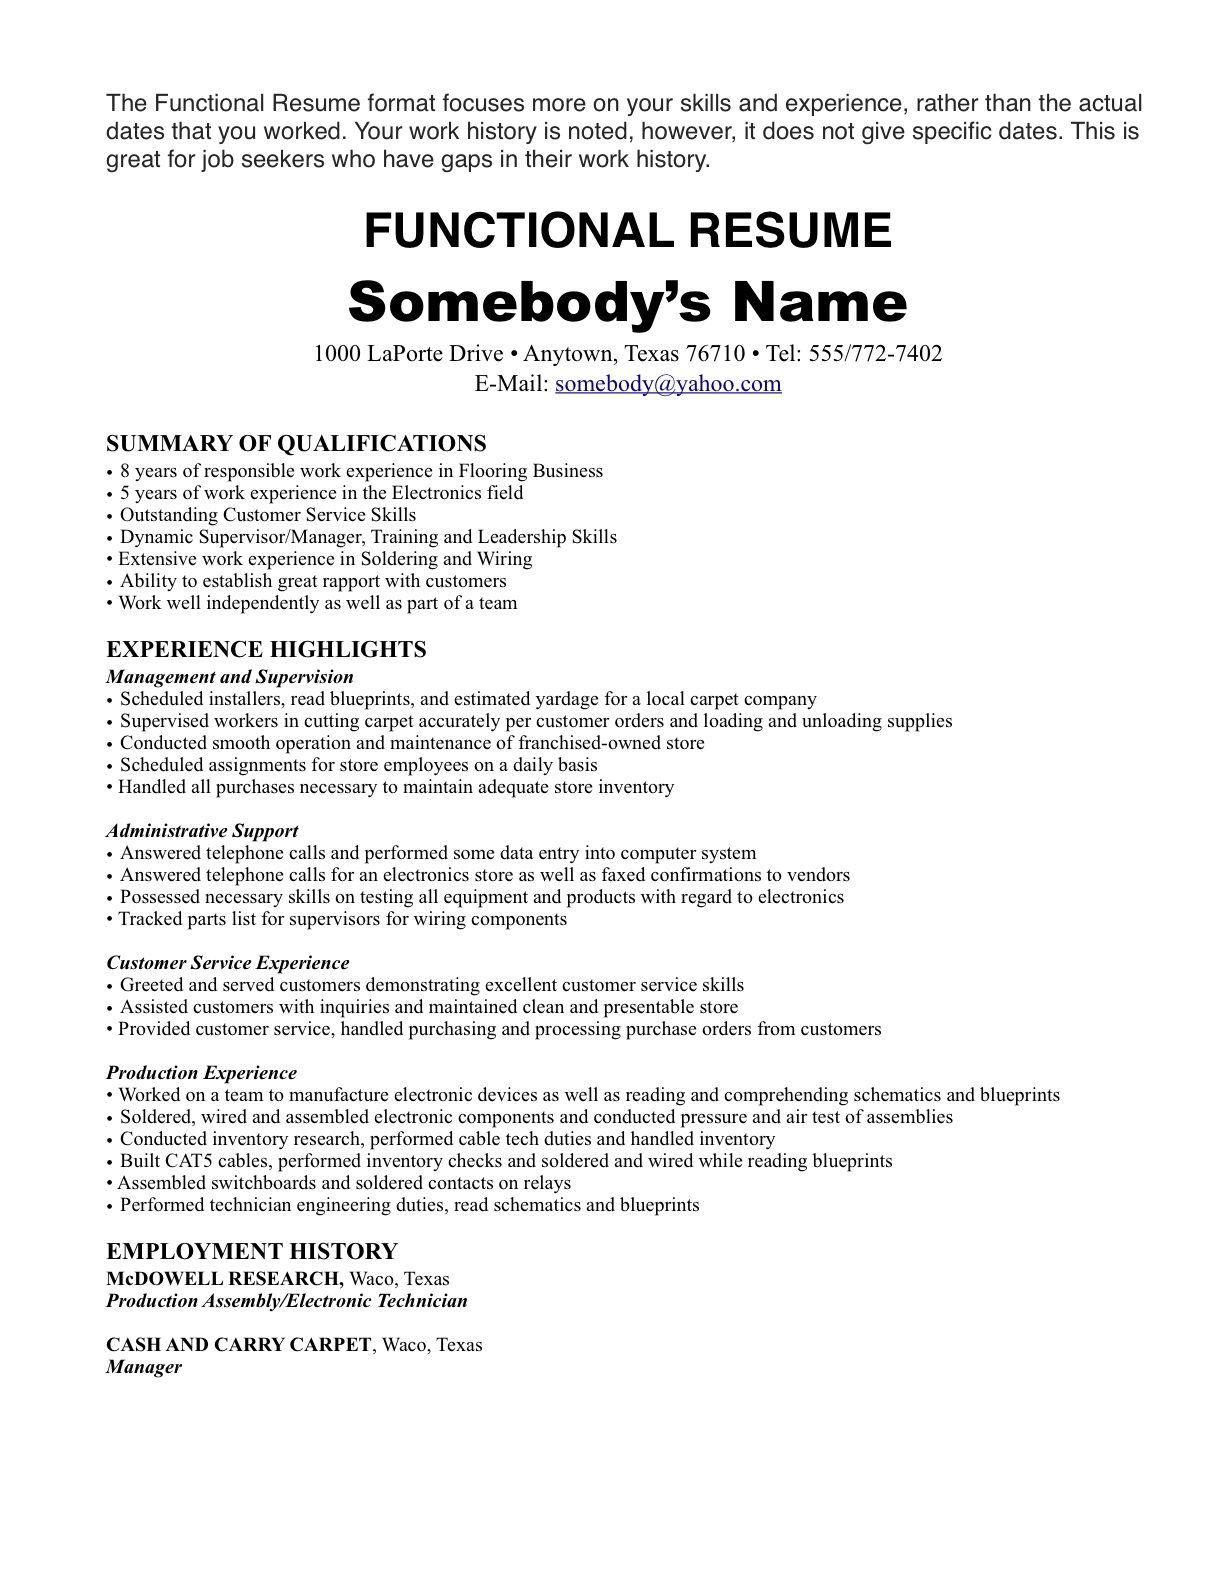 Resume Format One Job Job resume template, Job resume